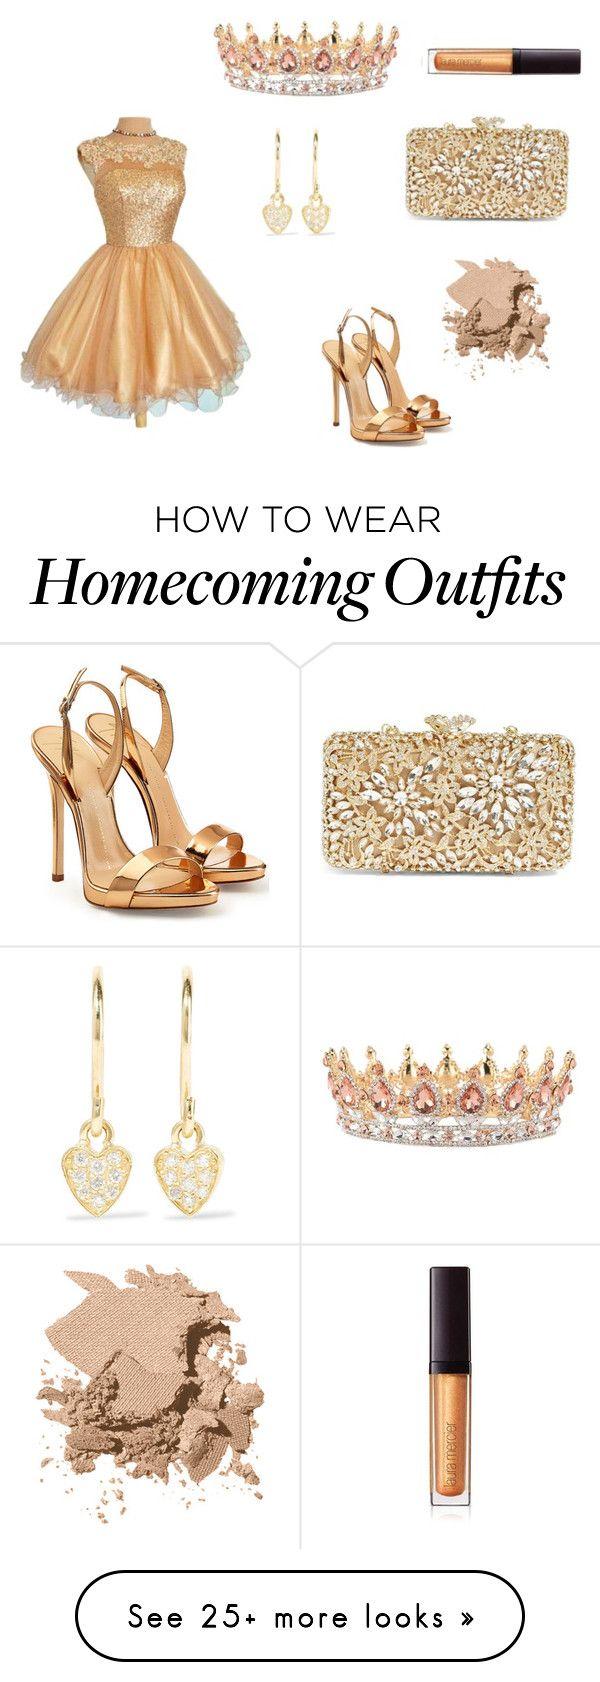 """Homecoming Queen"" by phat-panda on Polyvore featuring Giuseppe Zanotti, Glint, Jennifer Meyer Jewelry, Bobbi Brown Cosmetics and Laura Mercier"